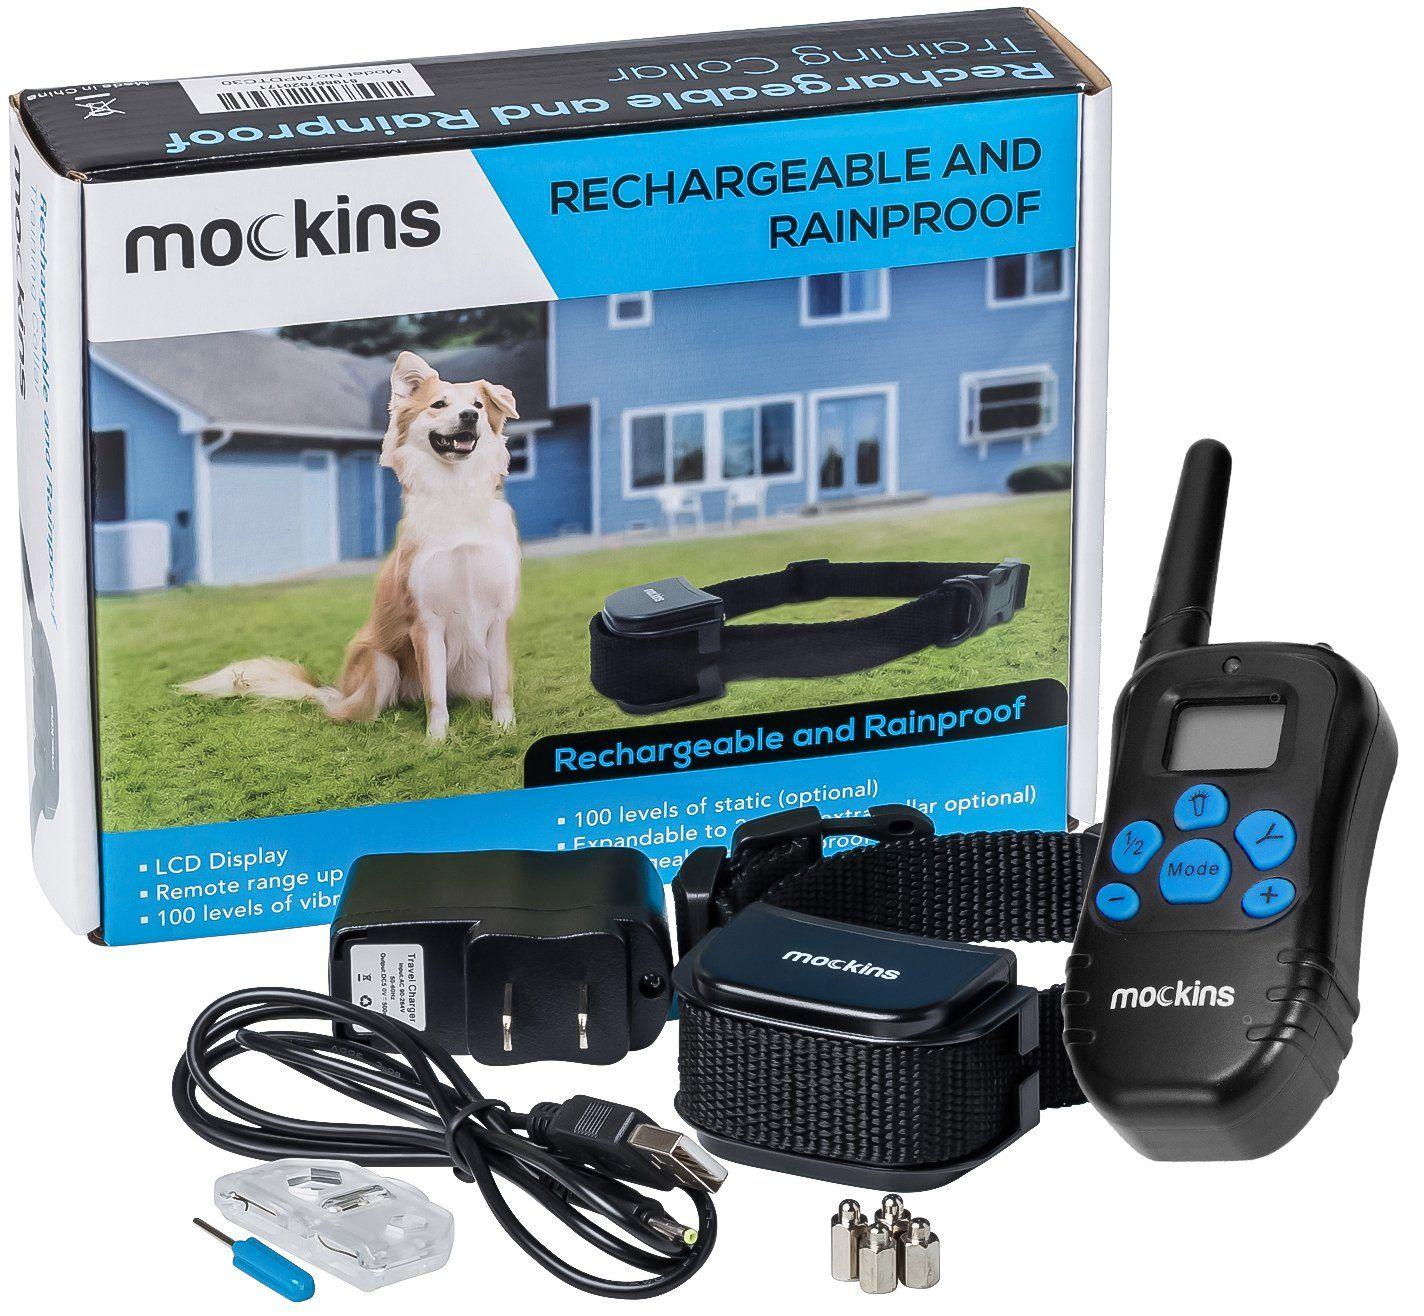 Mockins 100 Rainproof Rechargeable Electronic Remote Dog Training